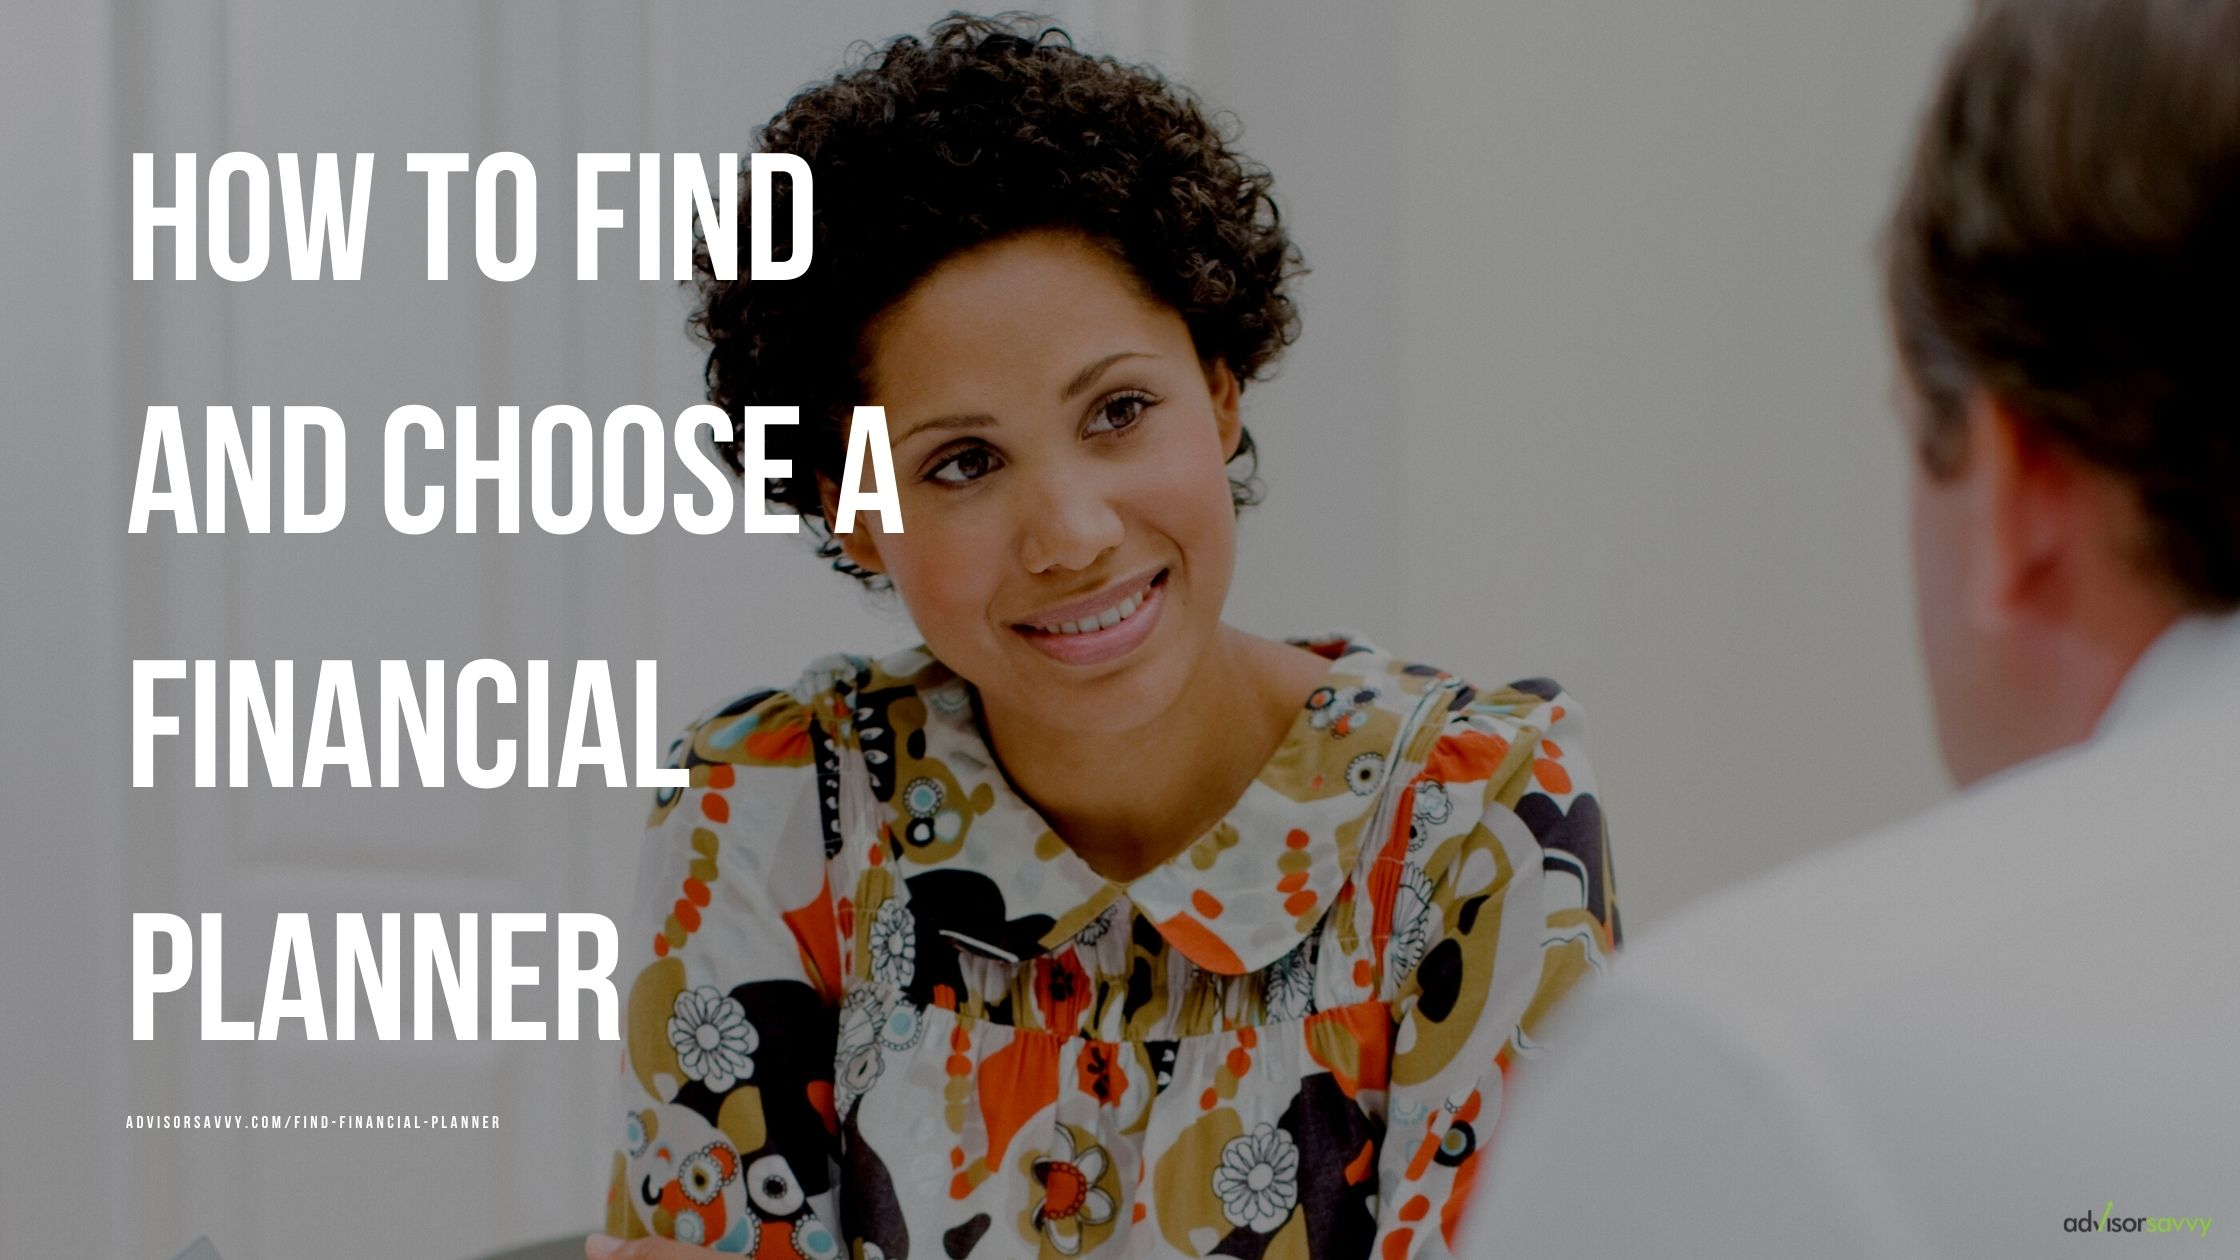 Find financial planner Canada blog